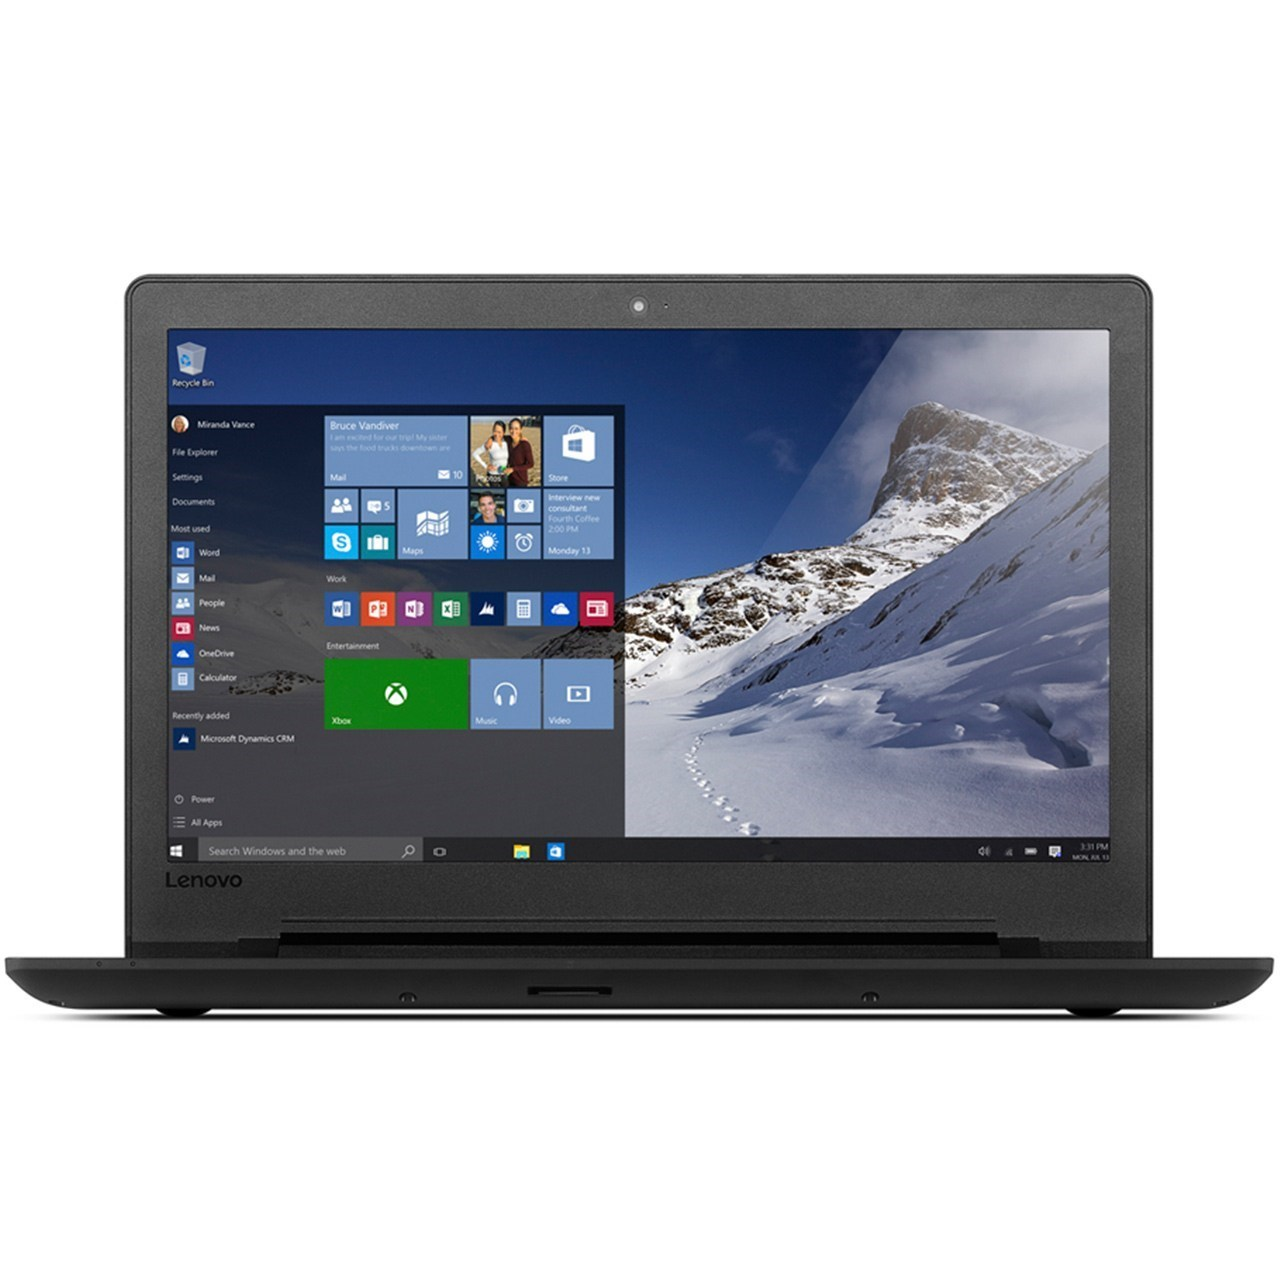 لپ تاپ 15 اینچی لنوو مدل Ideapad 110 - C